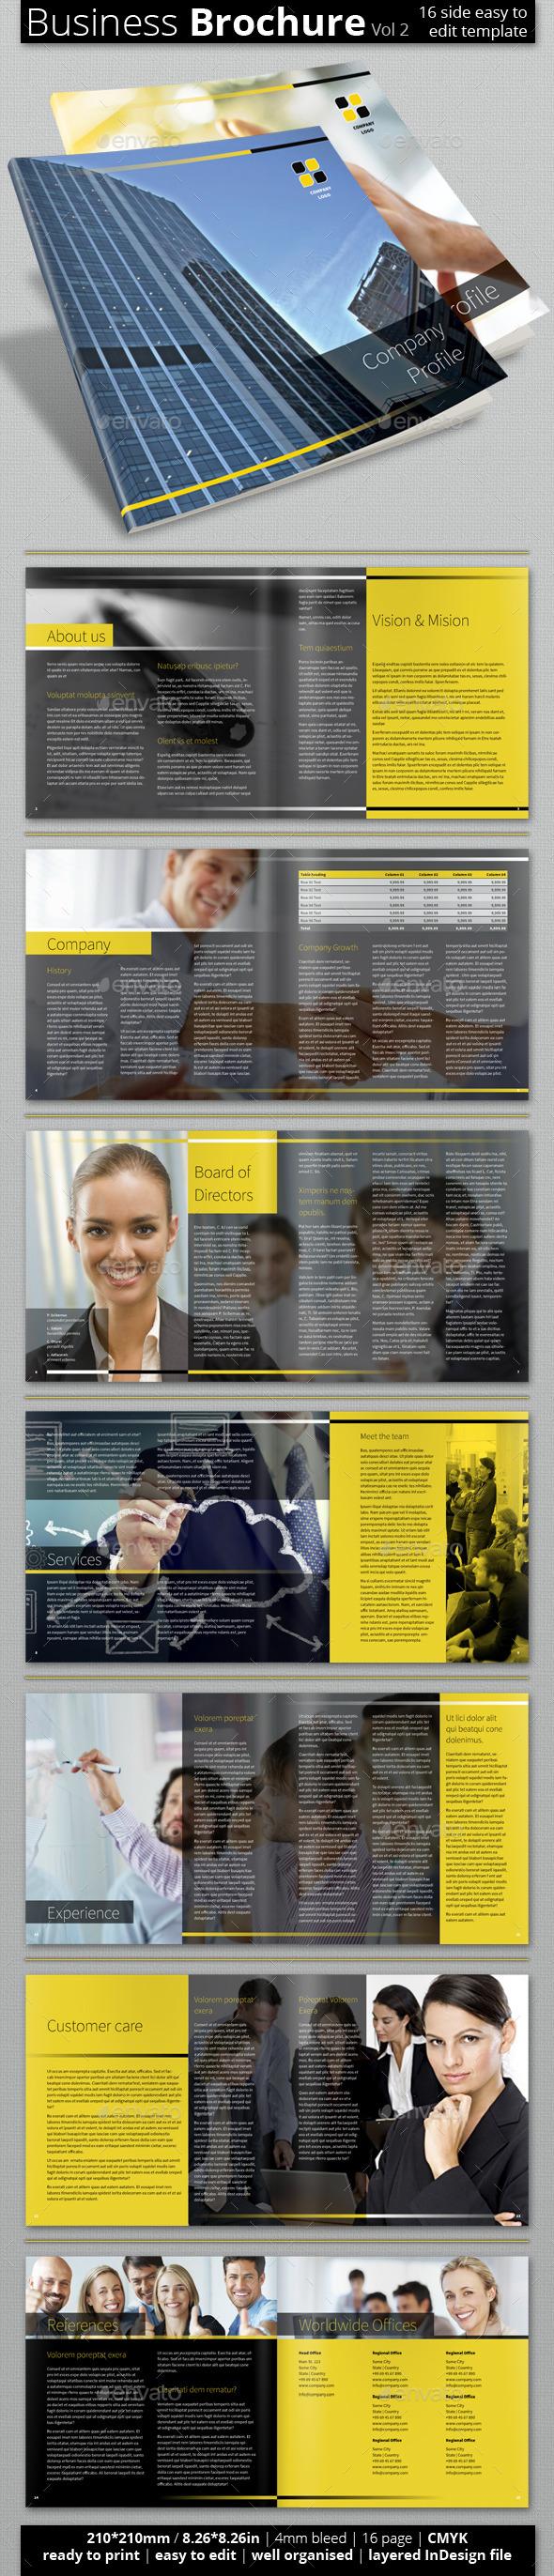 GraphicRiver Multipurpose Business Brochure Vol 2 9340797